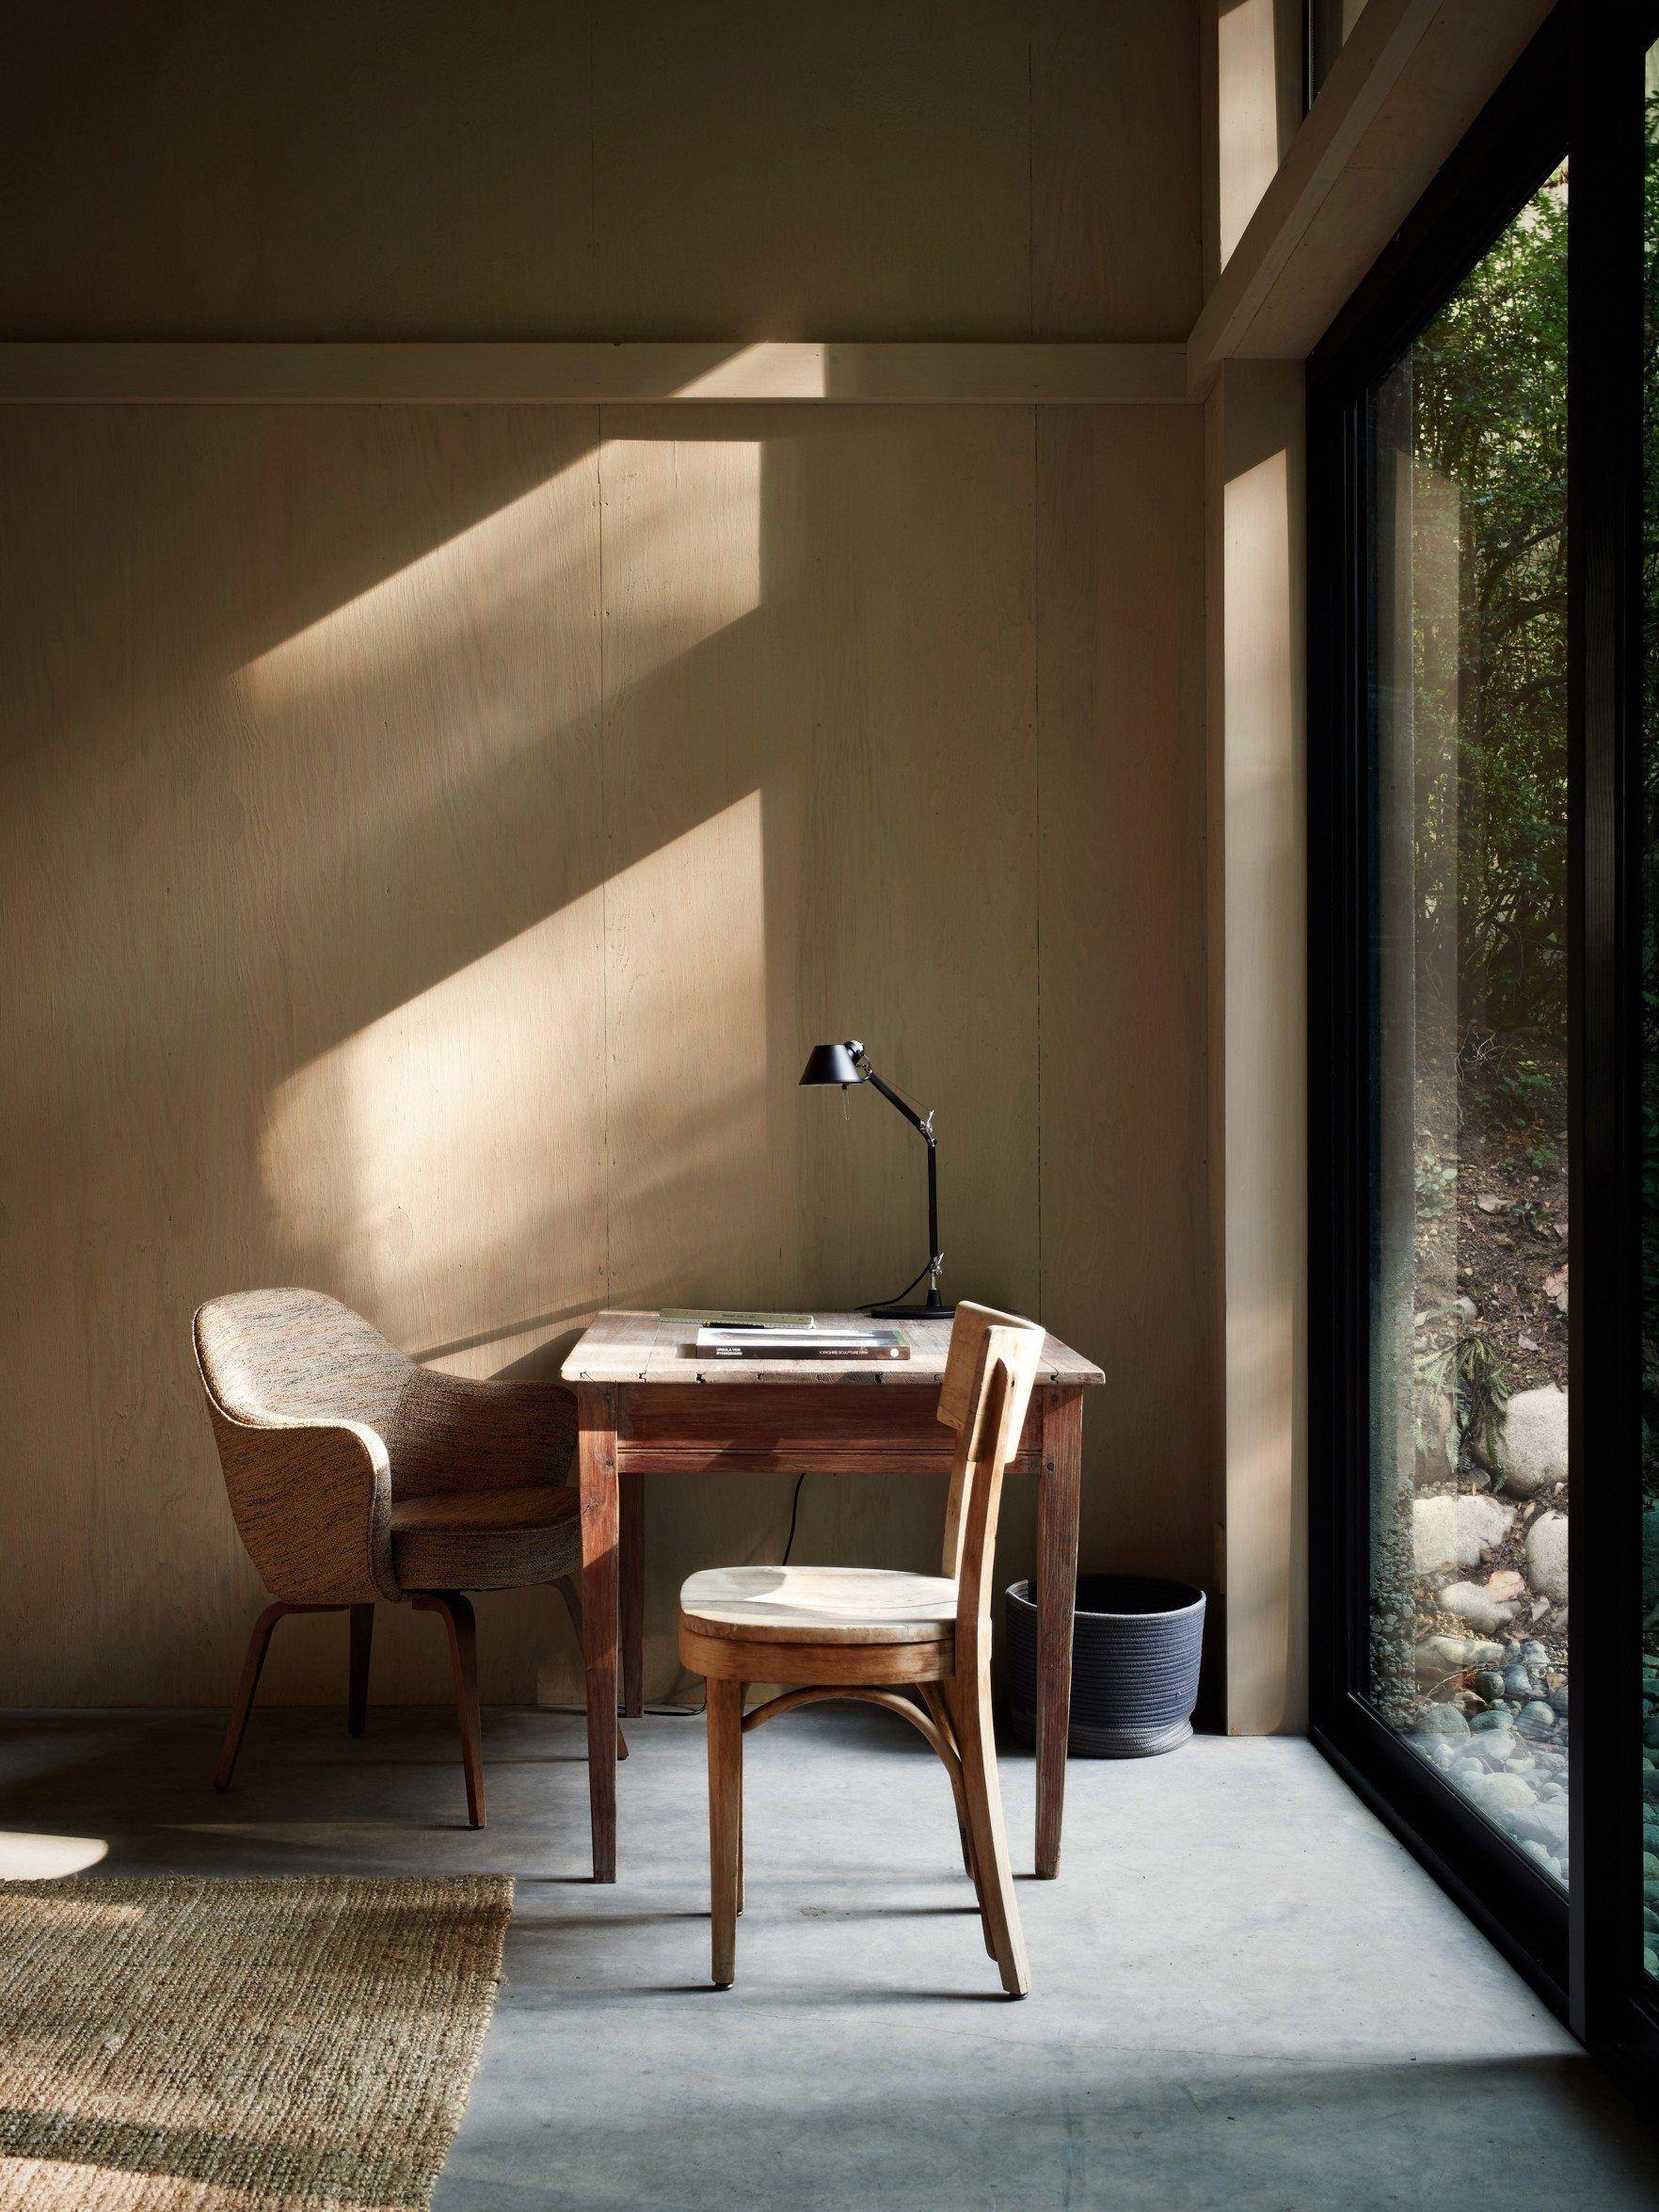 Casa Grande An Iconic Pink Luxury Retreat By Victor Legorreta